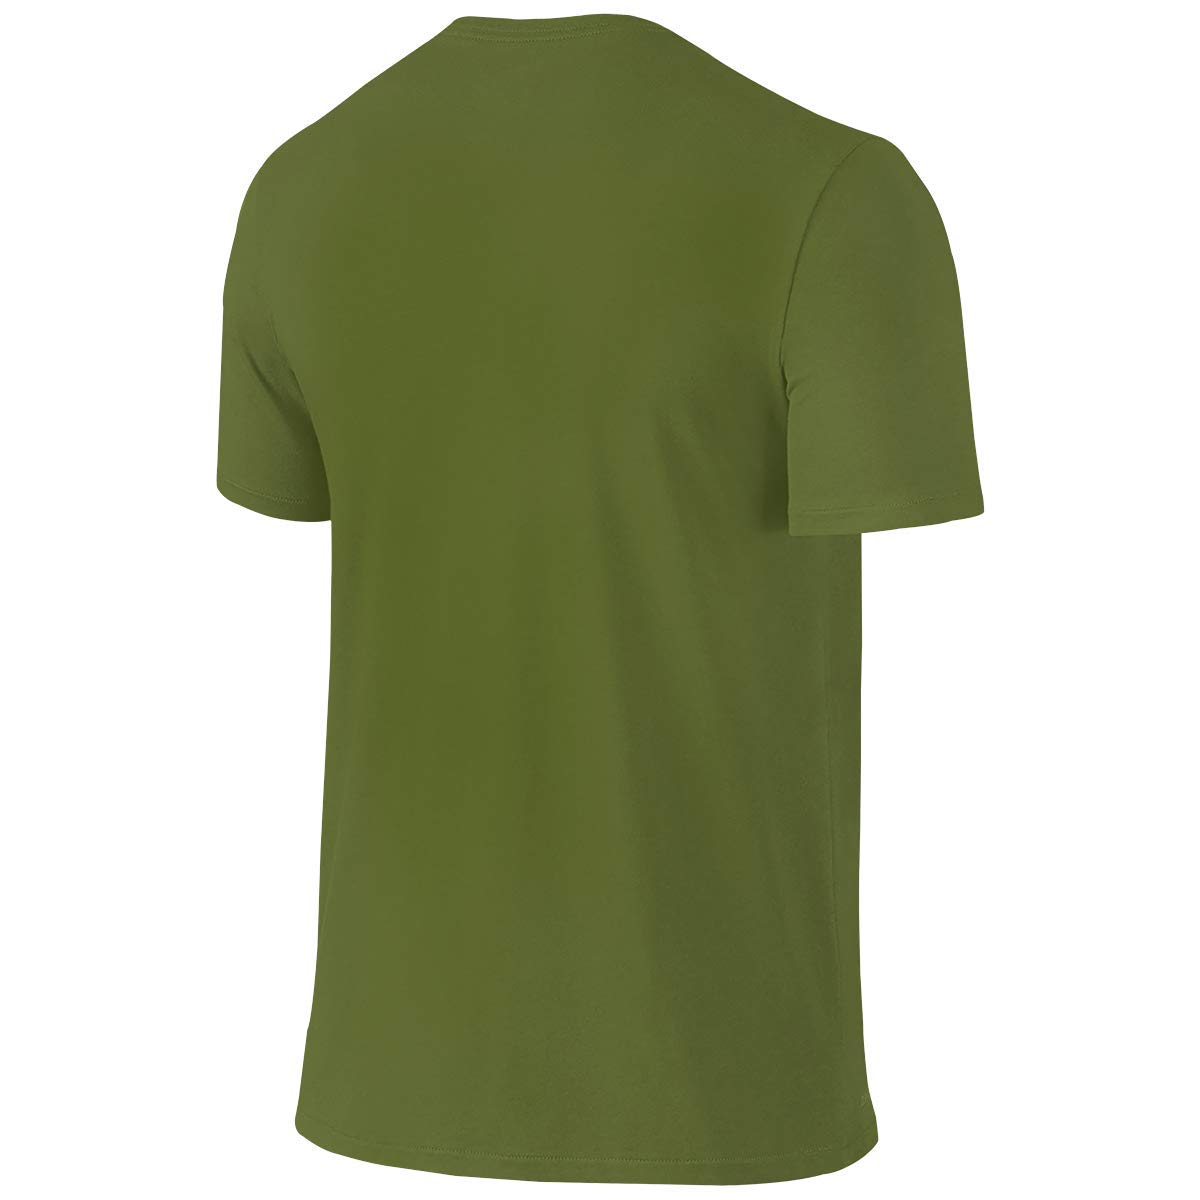 BingFeng New Designed T Shirt Victory Motorcycles Logo Fashion Funny Shirt O-Neck for Mens Black